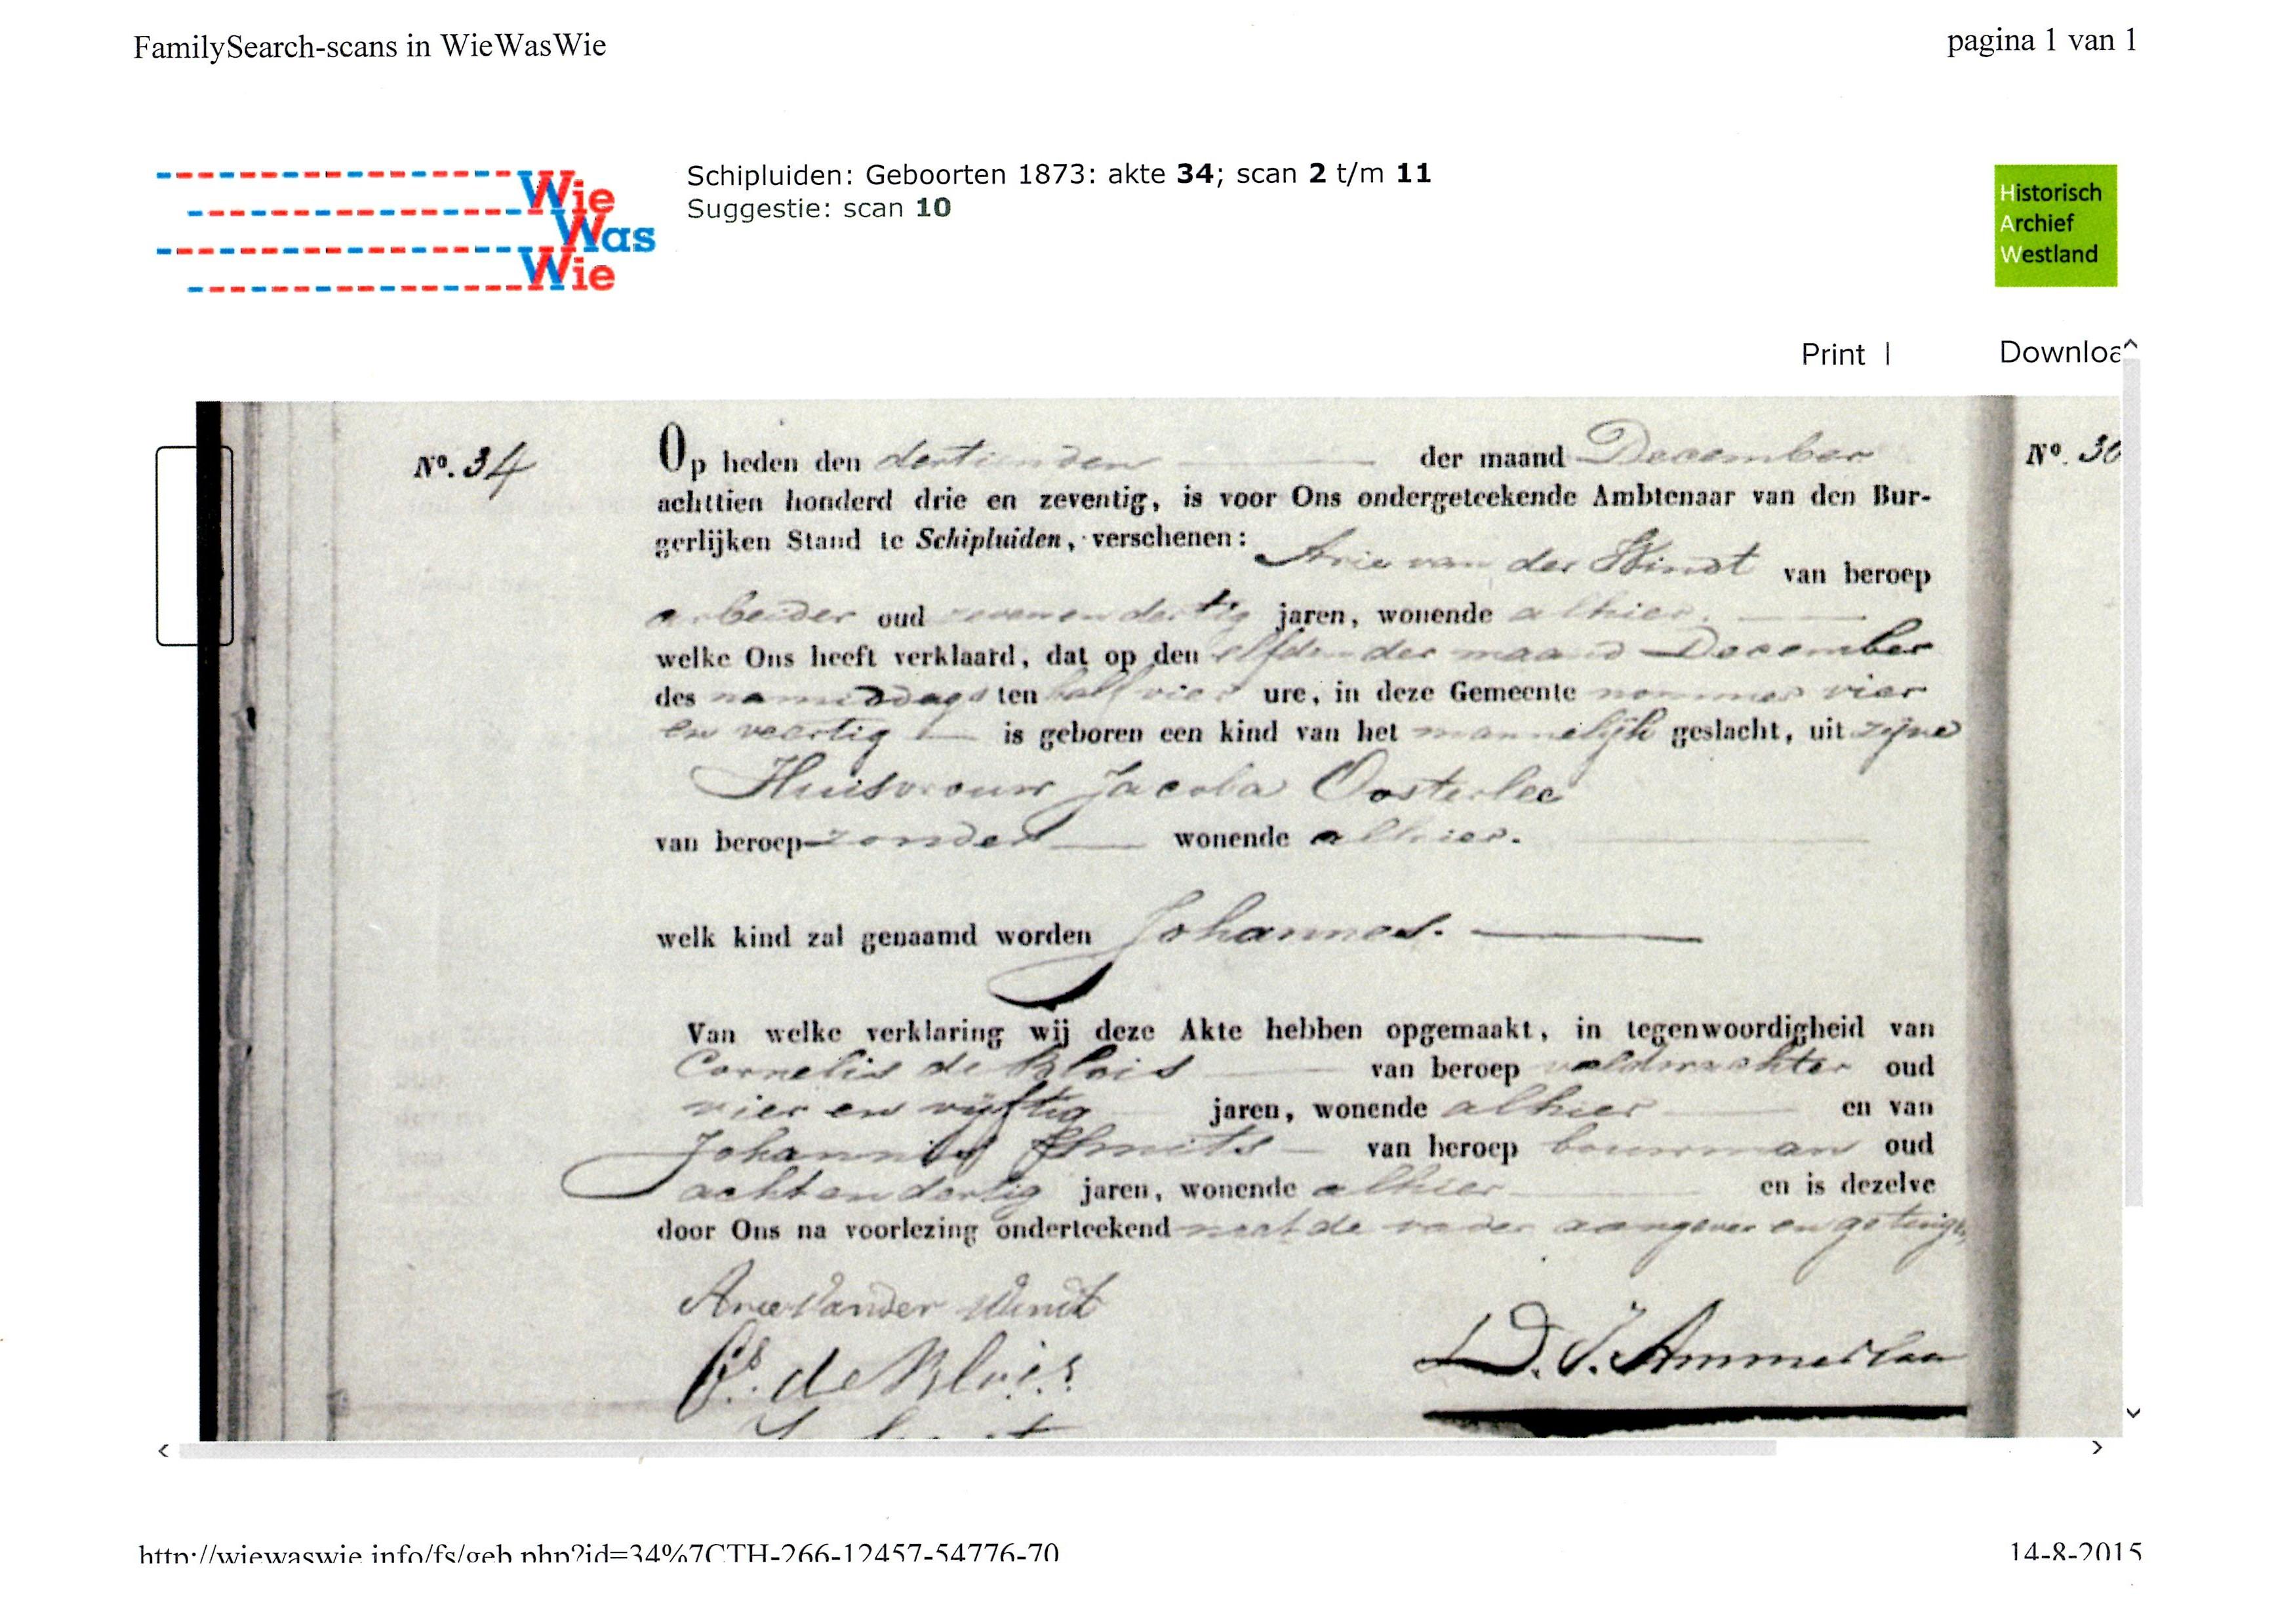 1873-12-11 Geboorte akte Johannes